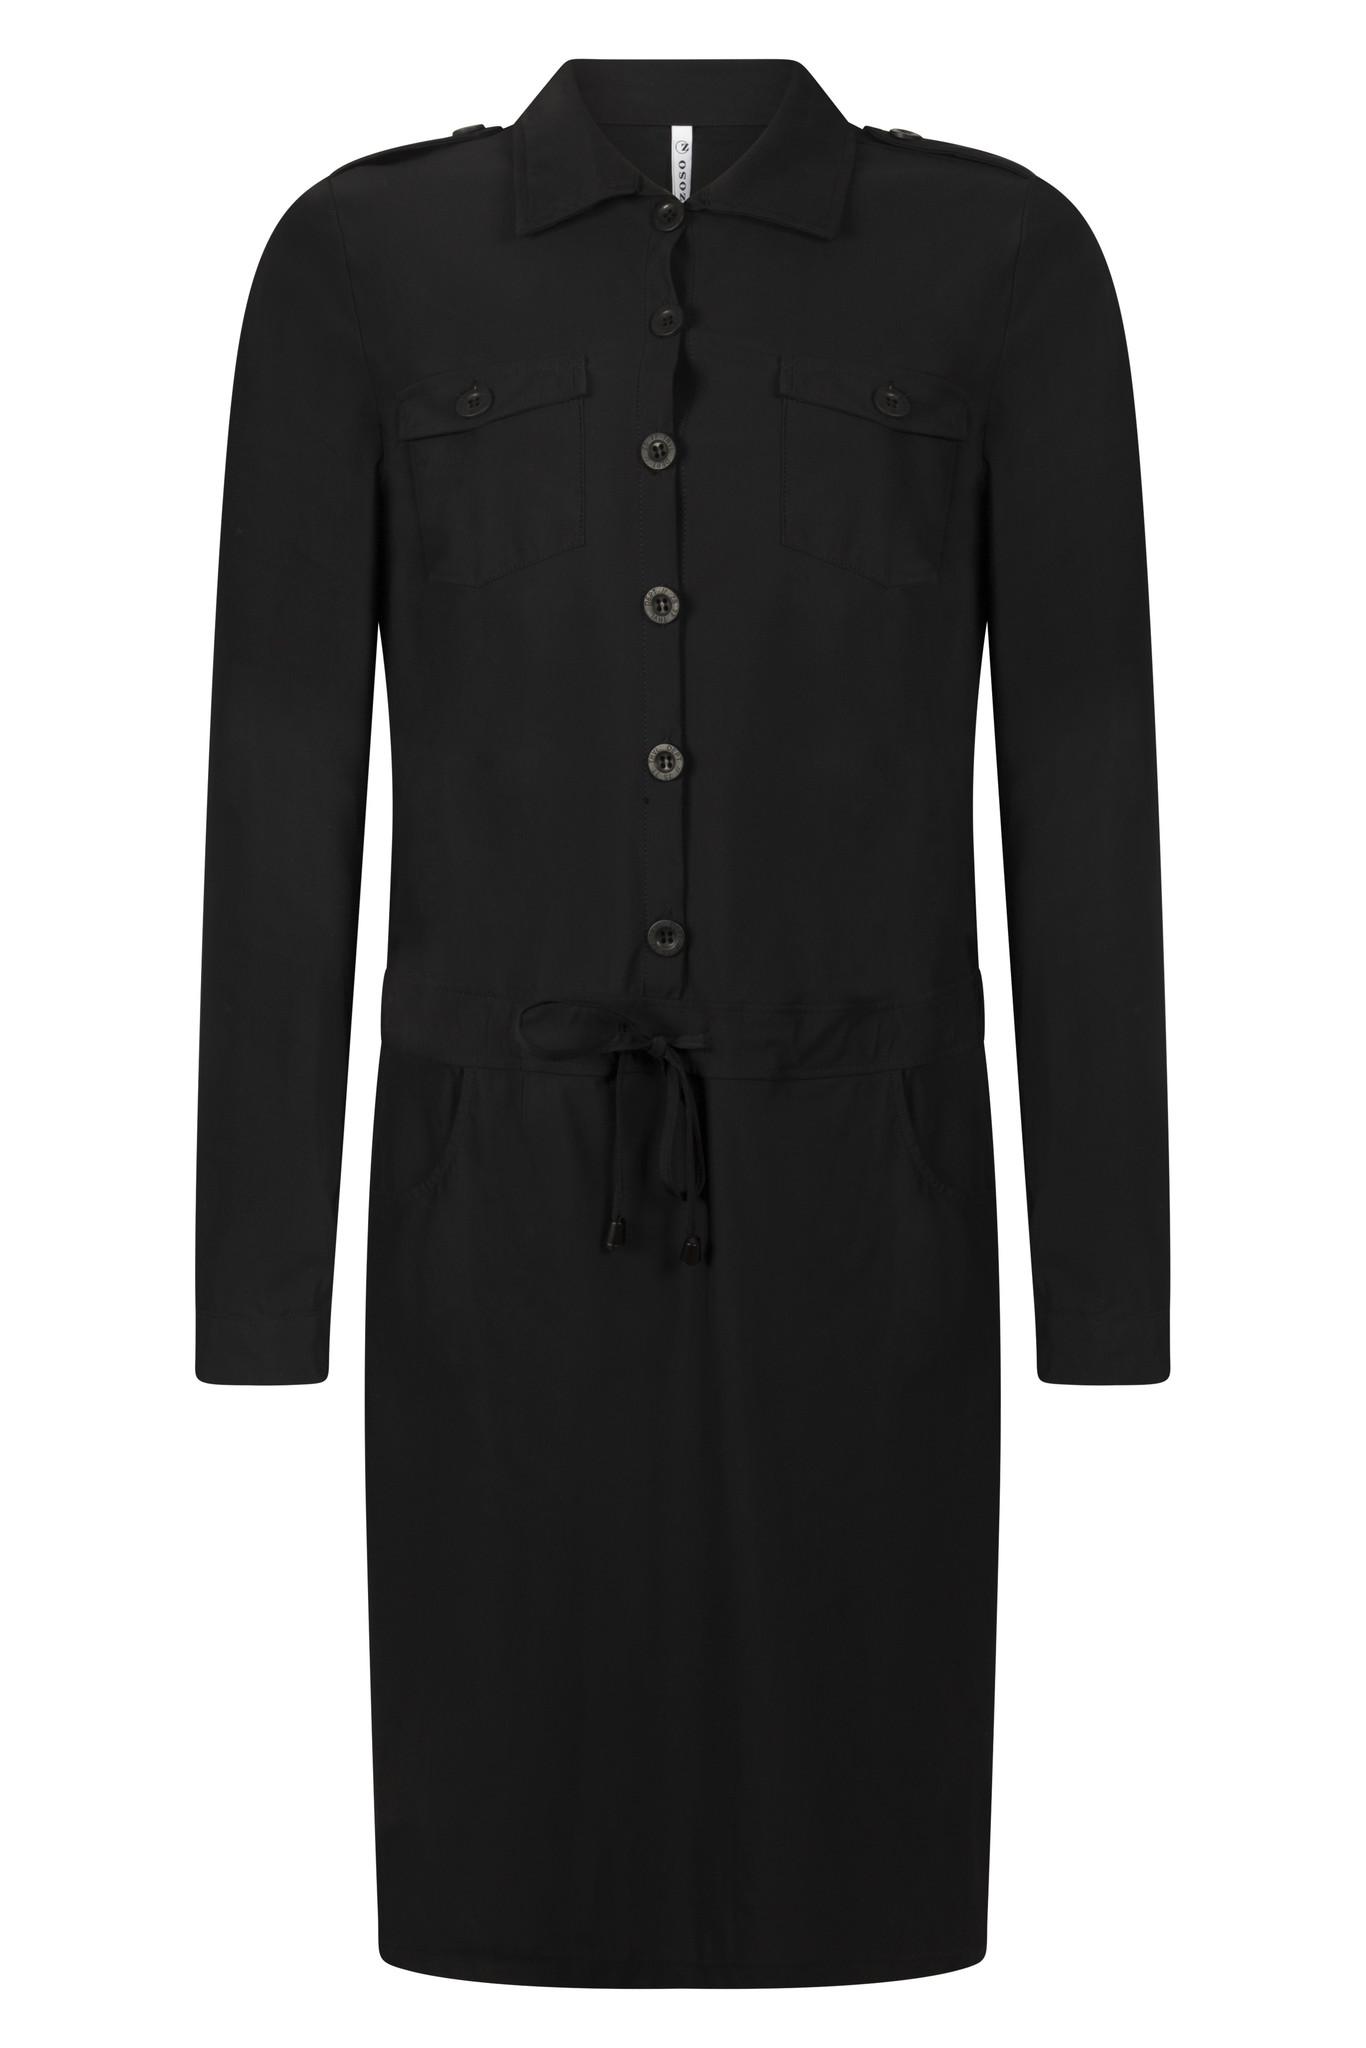 Zoso Zoso Moniek travel dress  Black